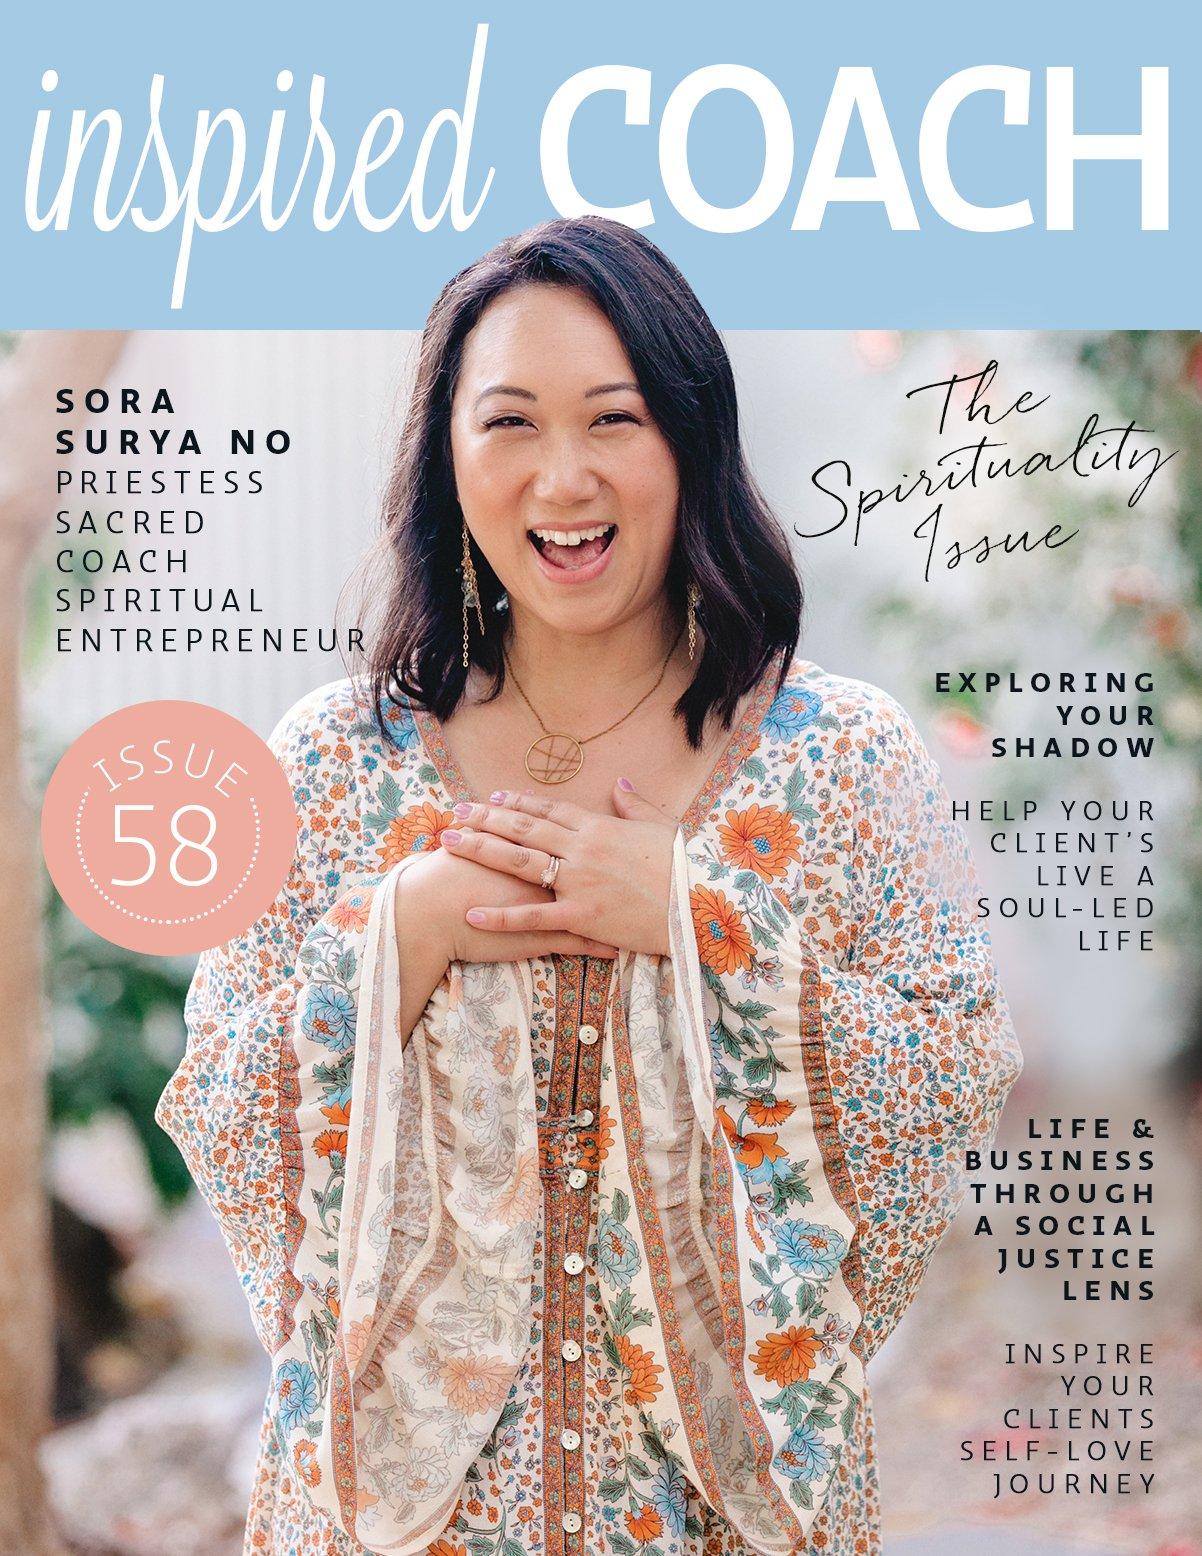 inspired COACH Magazine with Sora Surya No